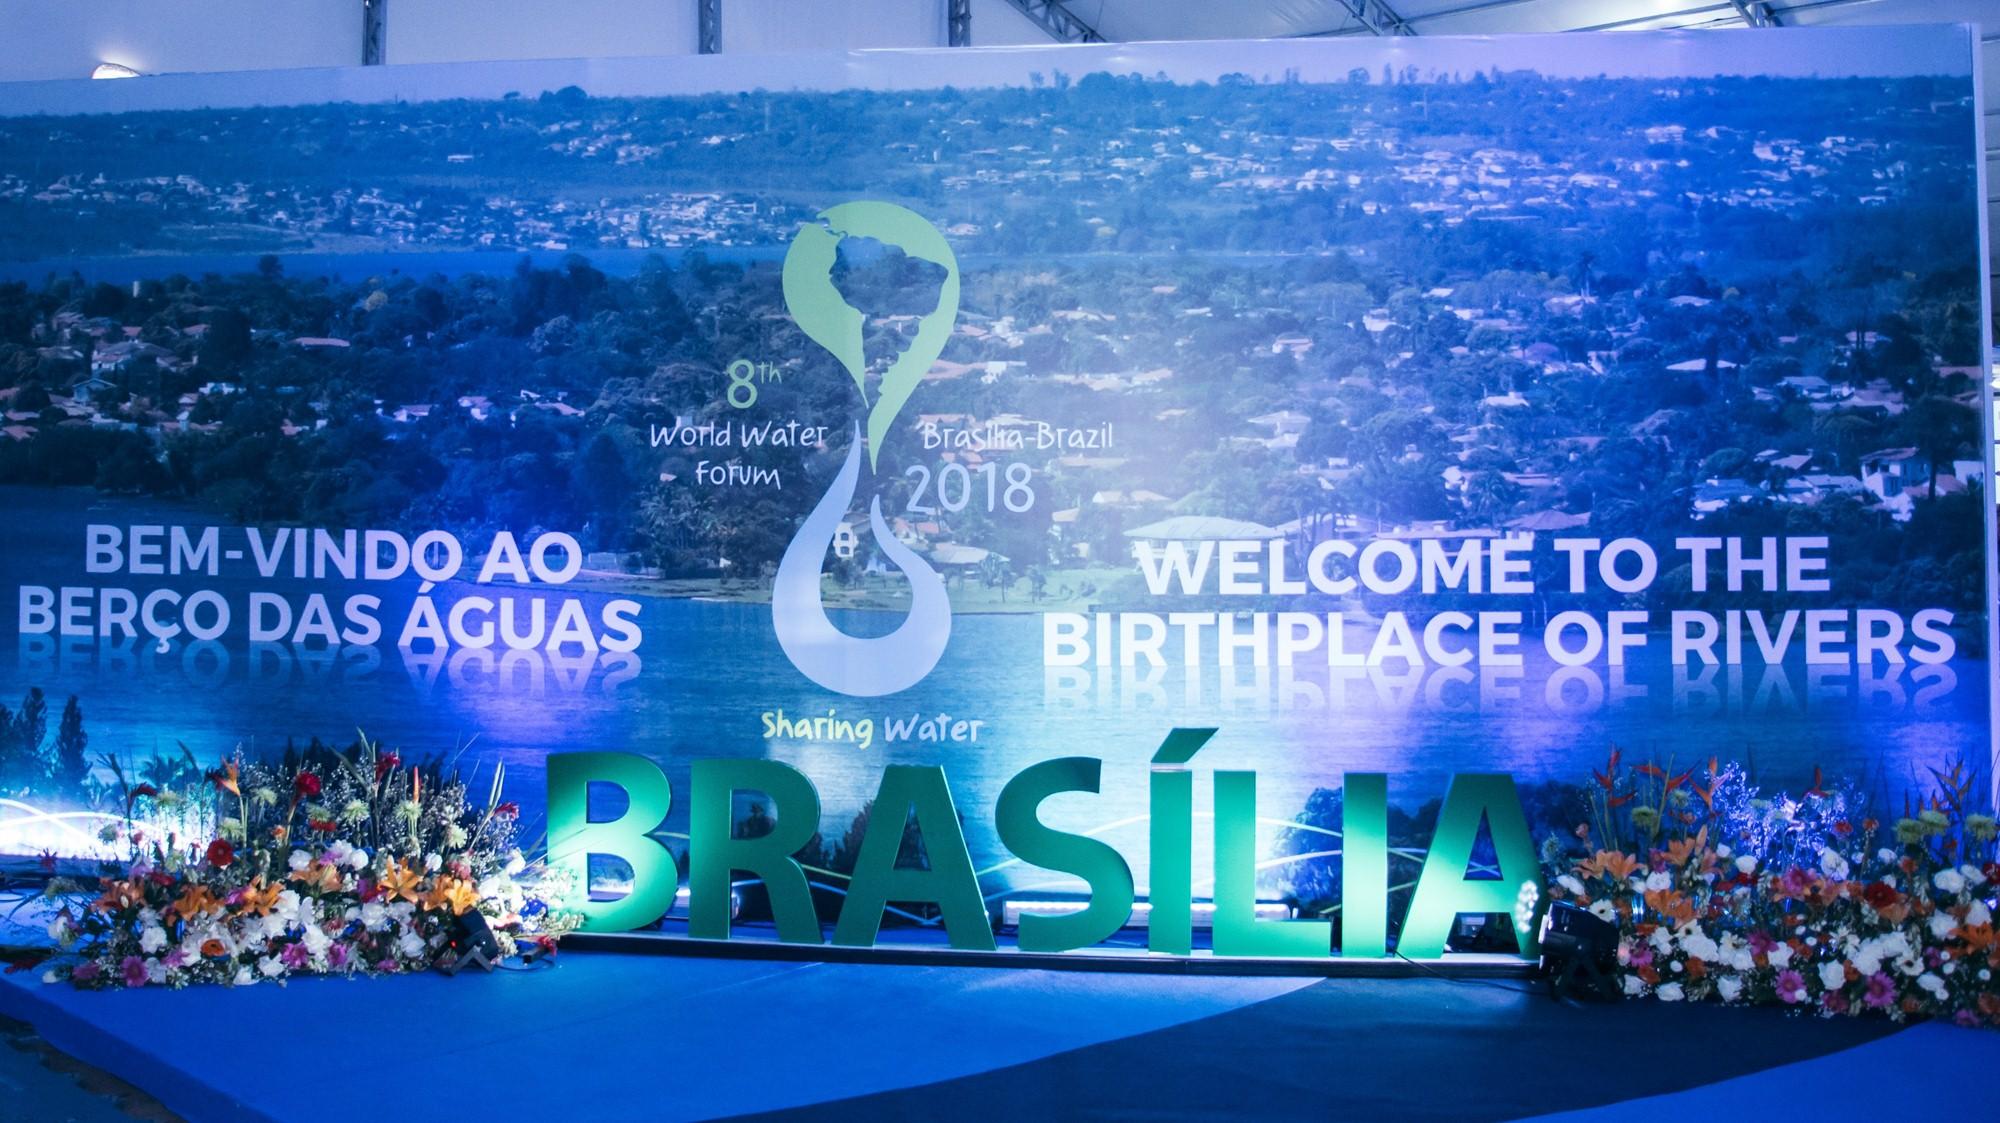 Birthplace of rivers Brasilia